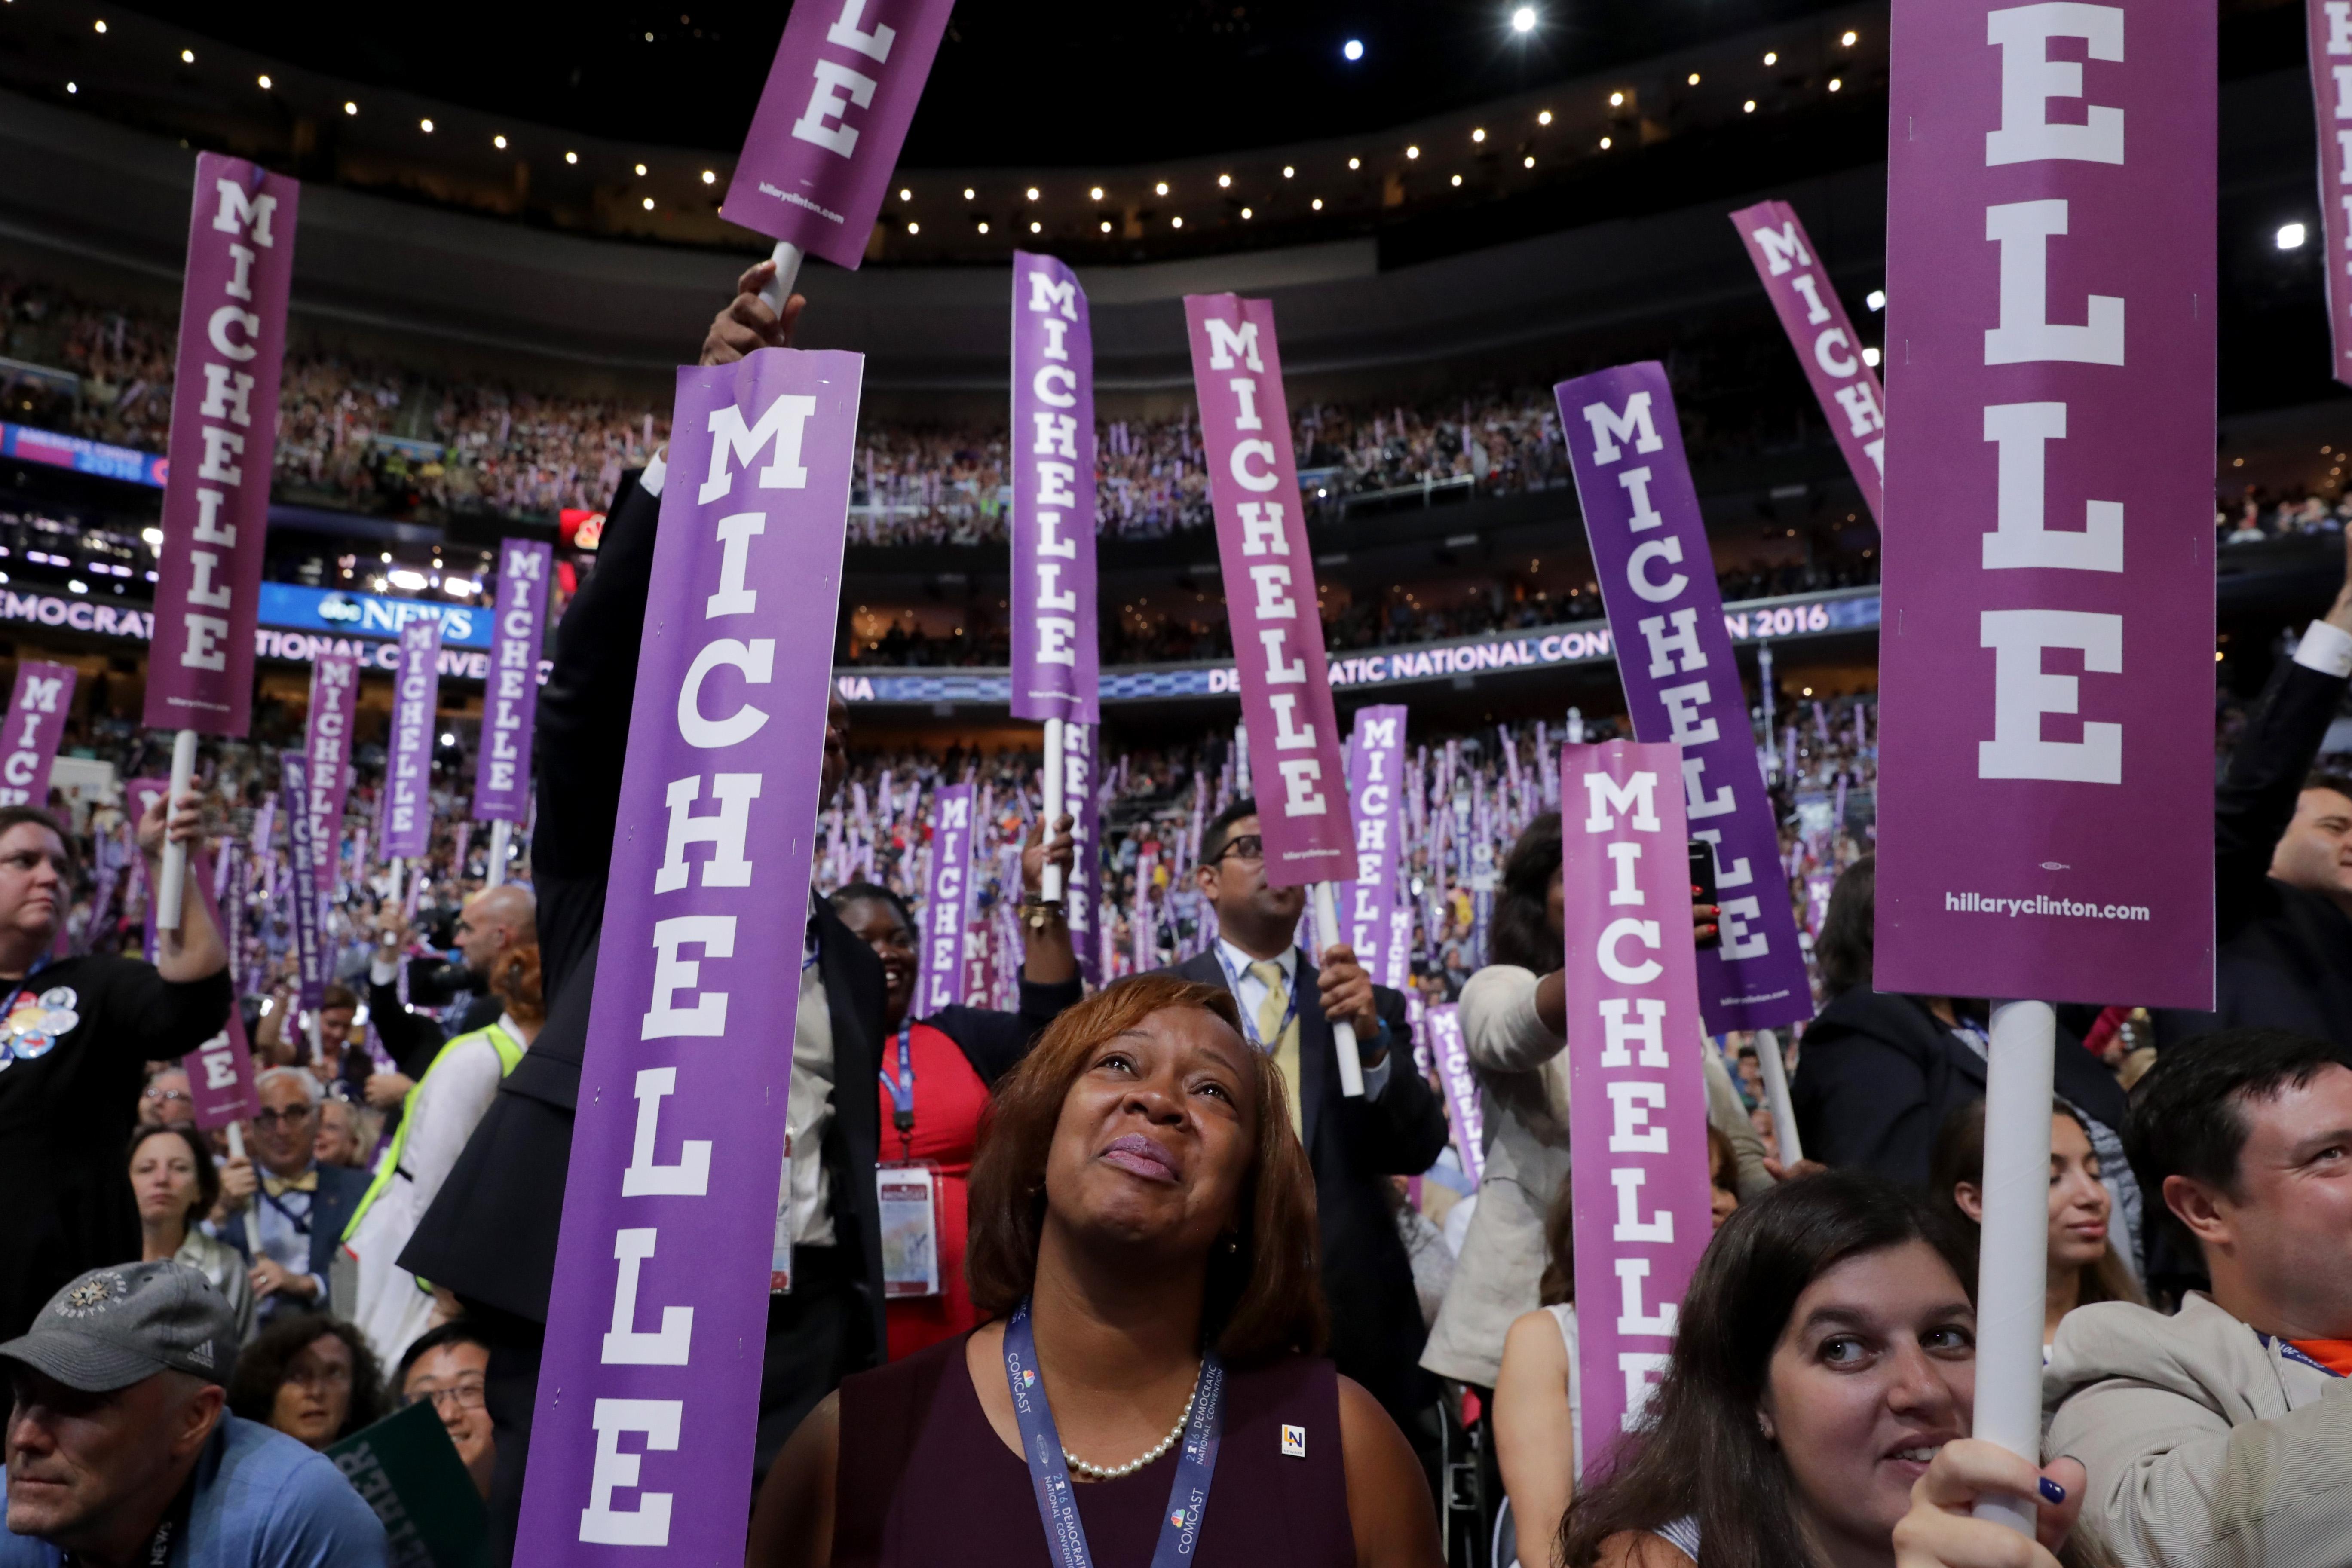 Michelle Obama DNC speech transcript: read the speech Democrats loved so much